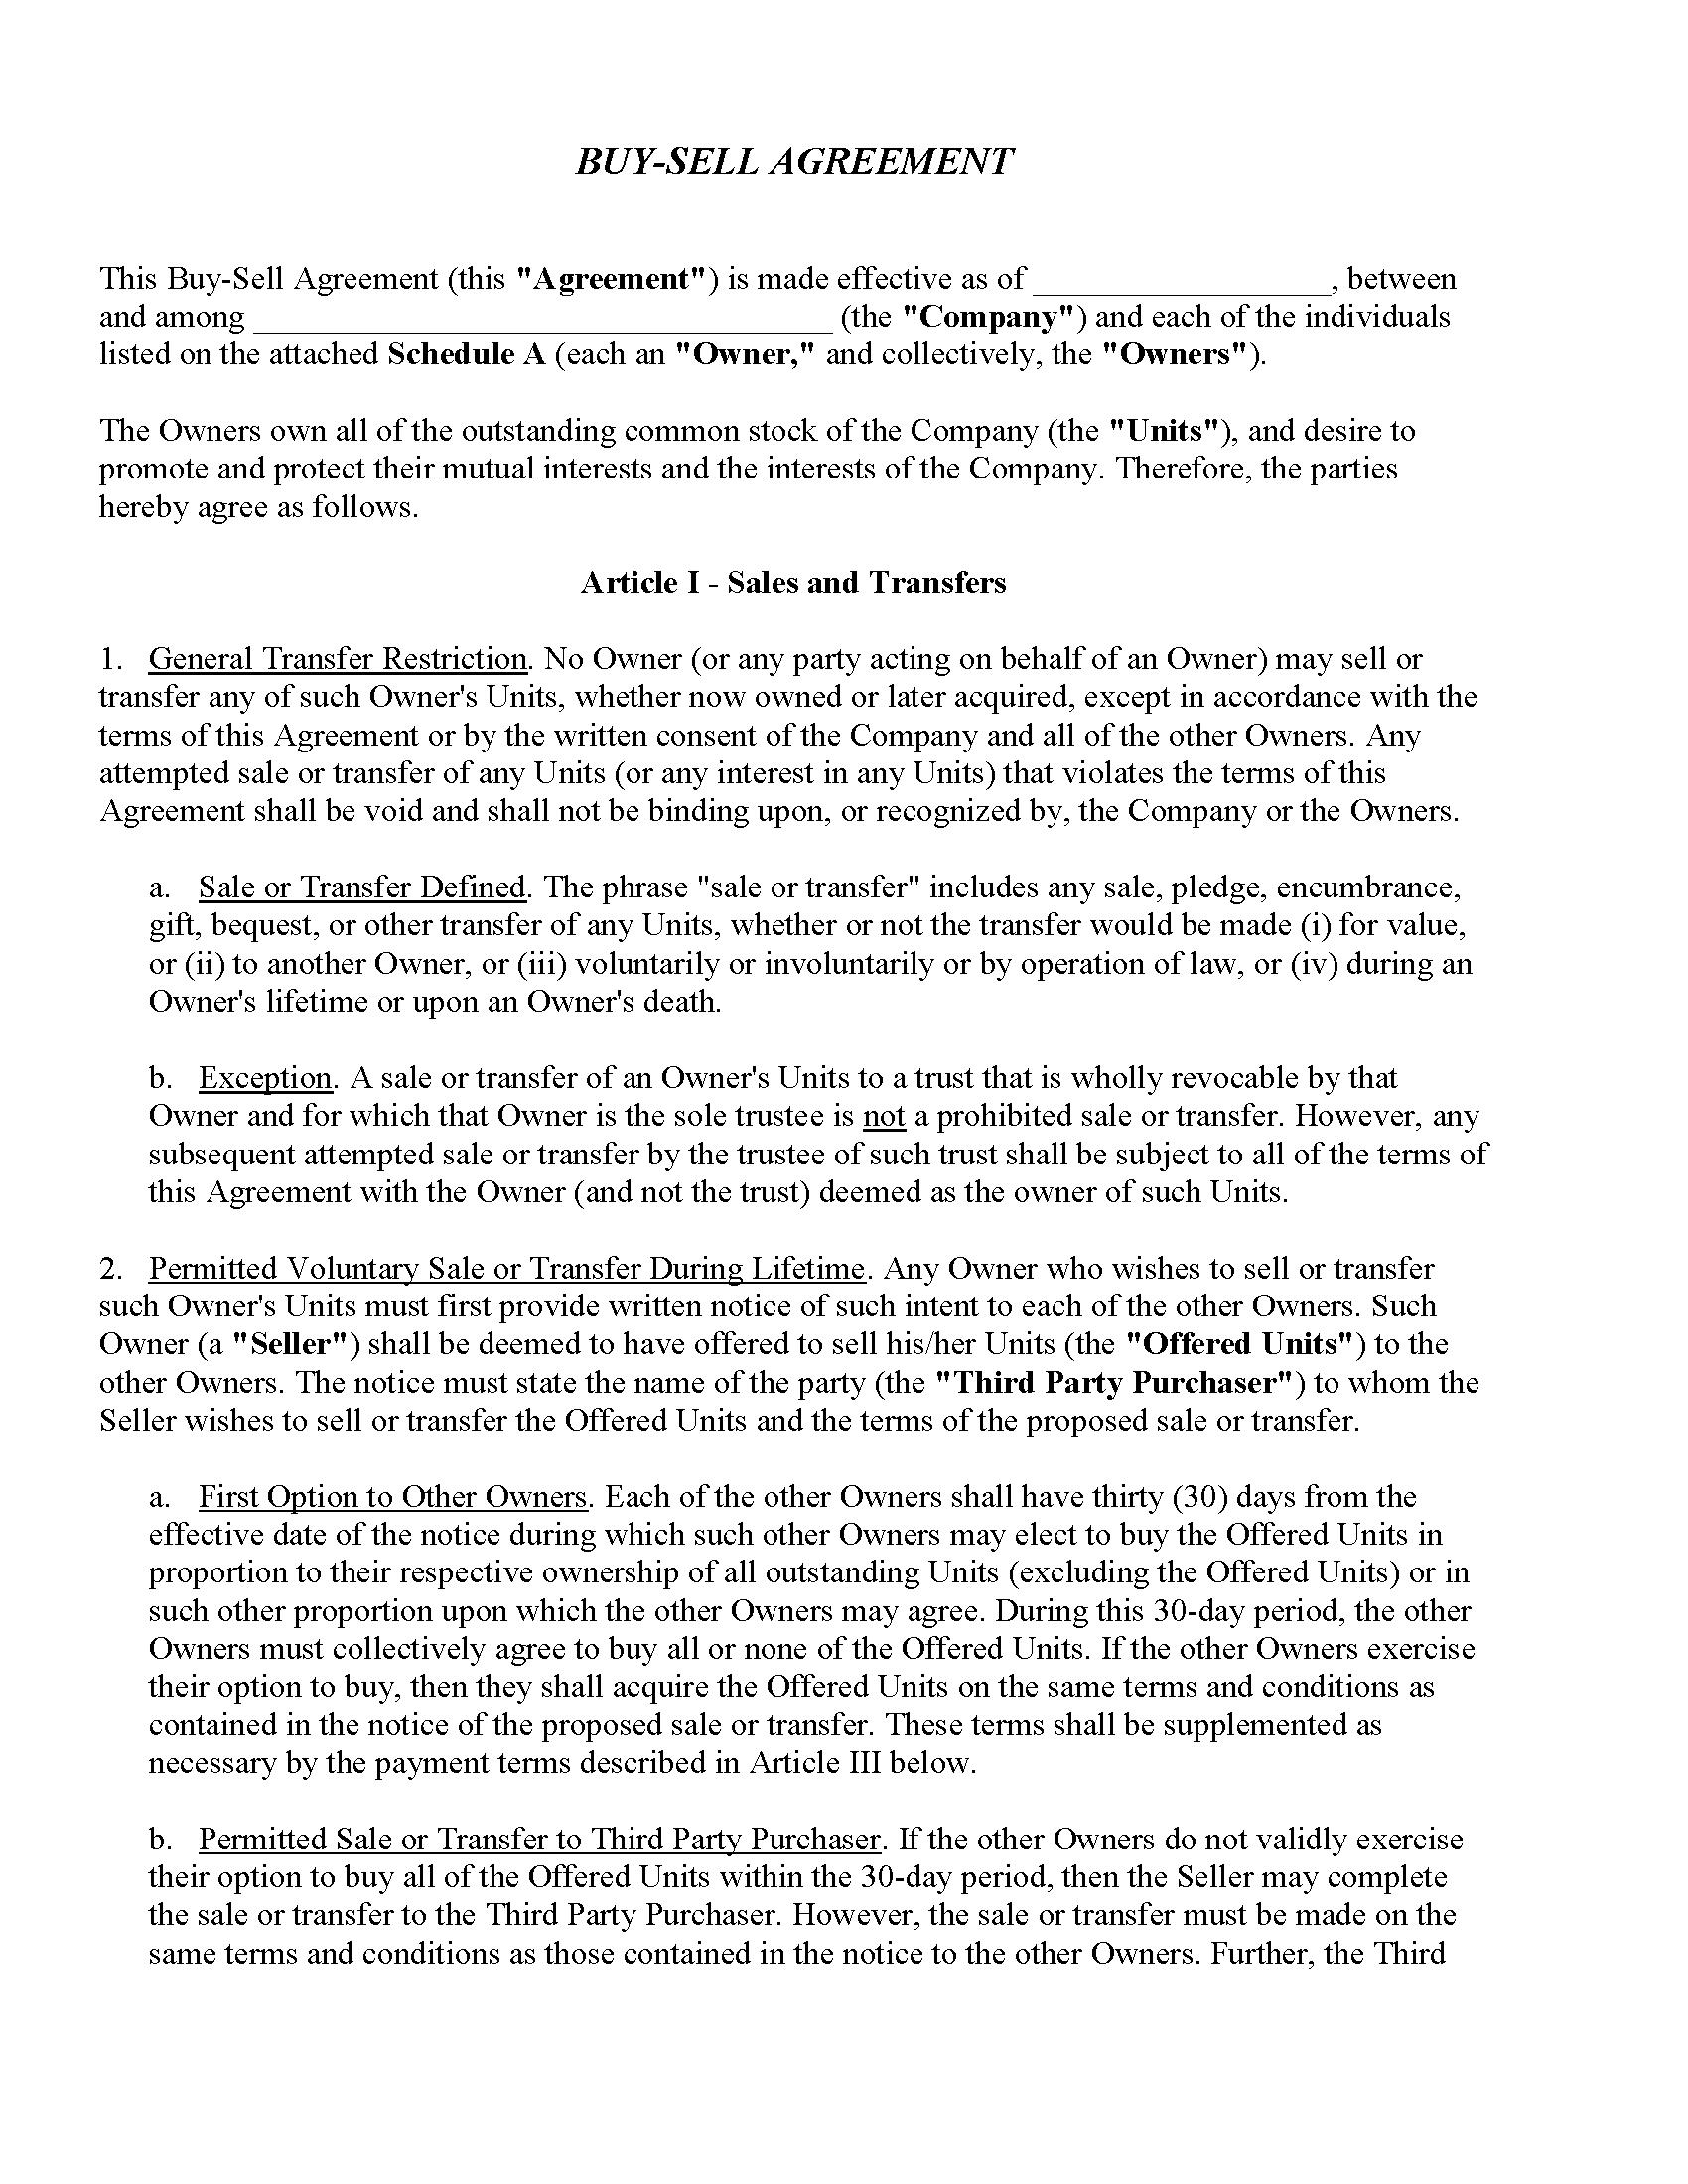 South Dakota Buy-Sell Agreement